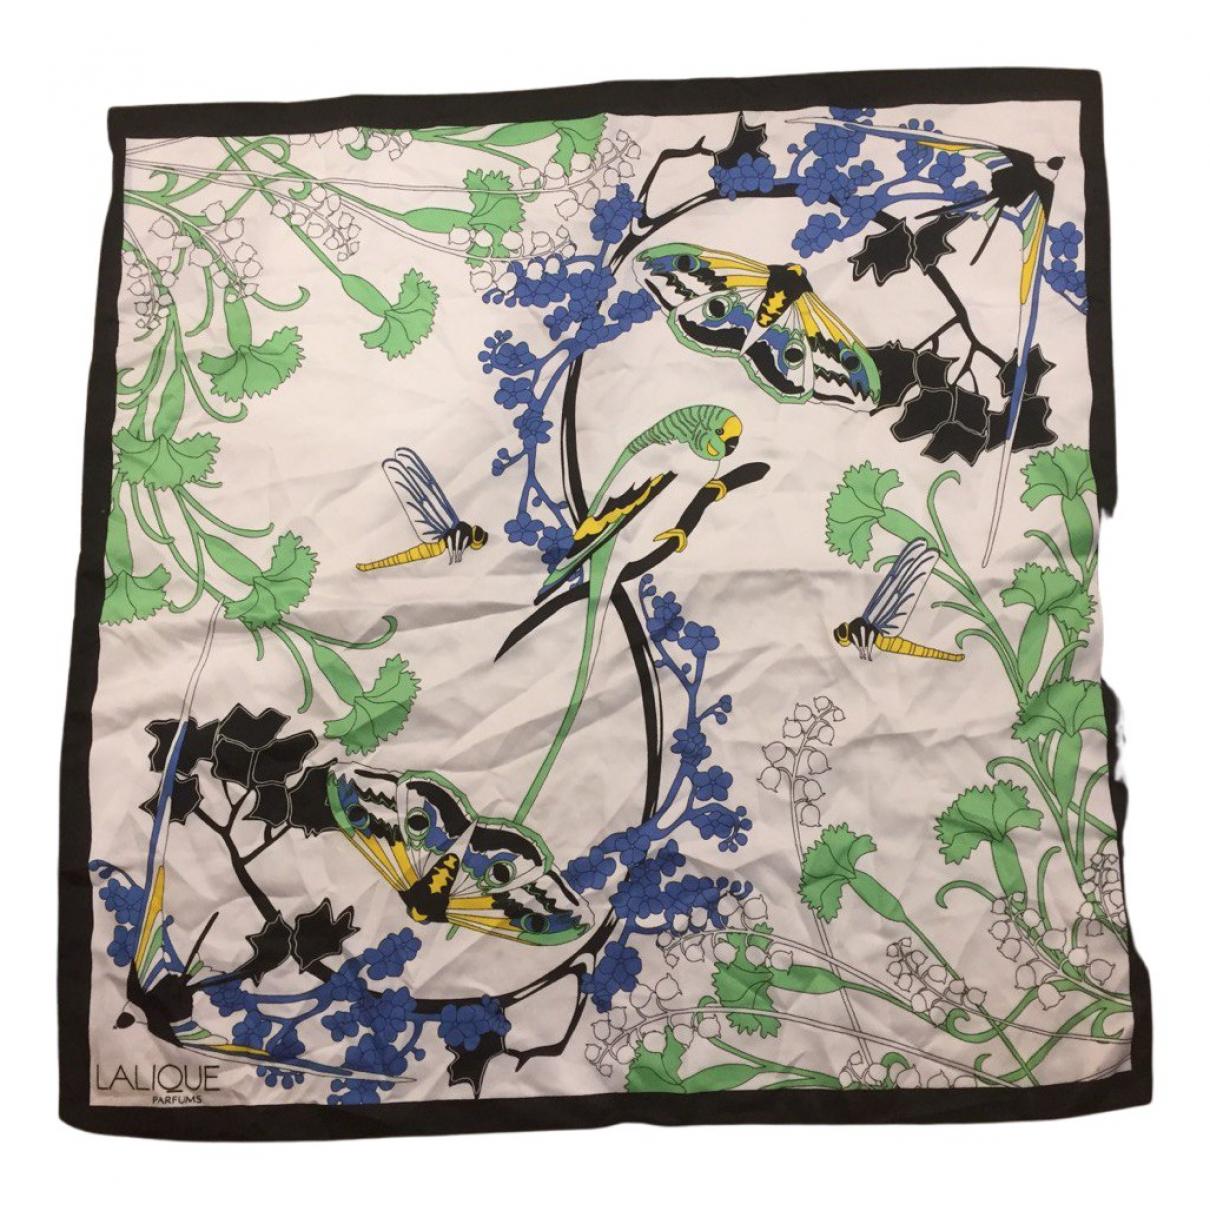 Lalique \N Tuecher in  Bunt Polyester